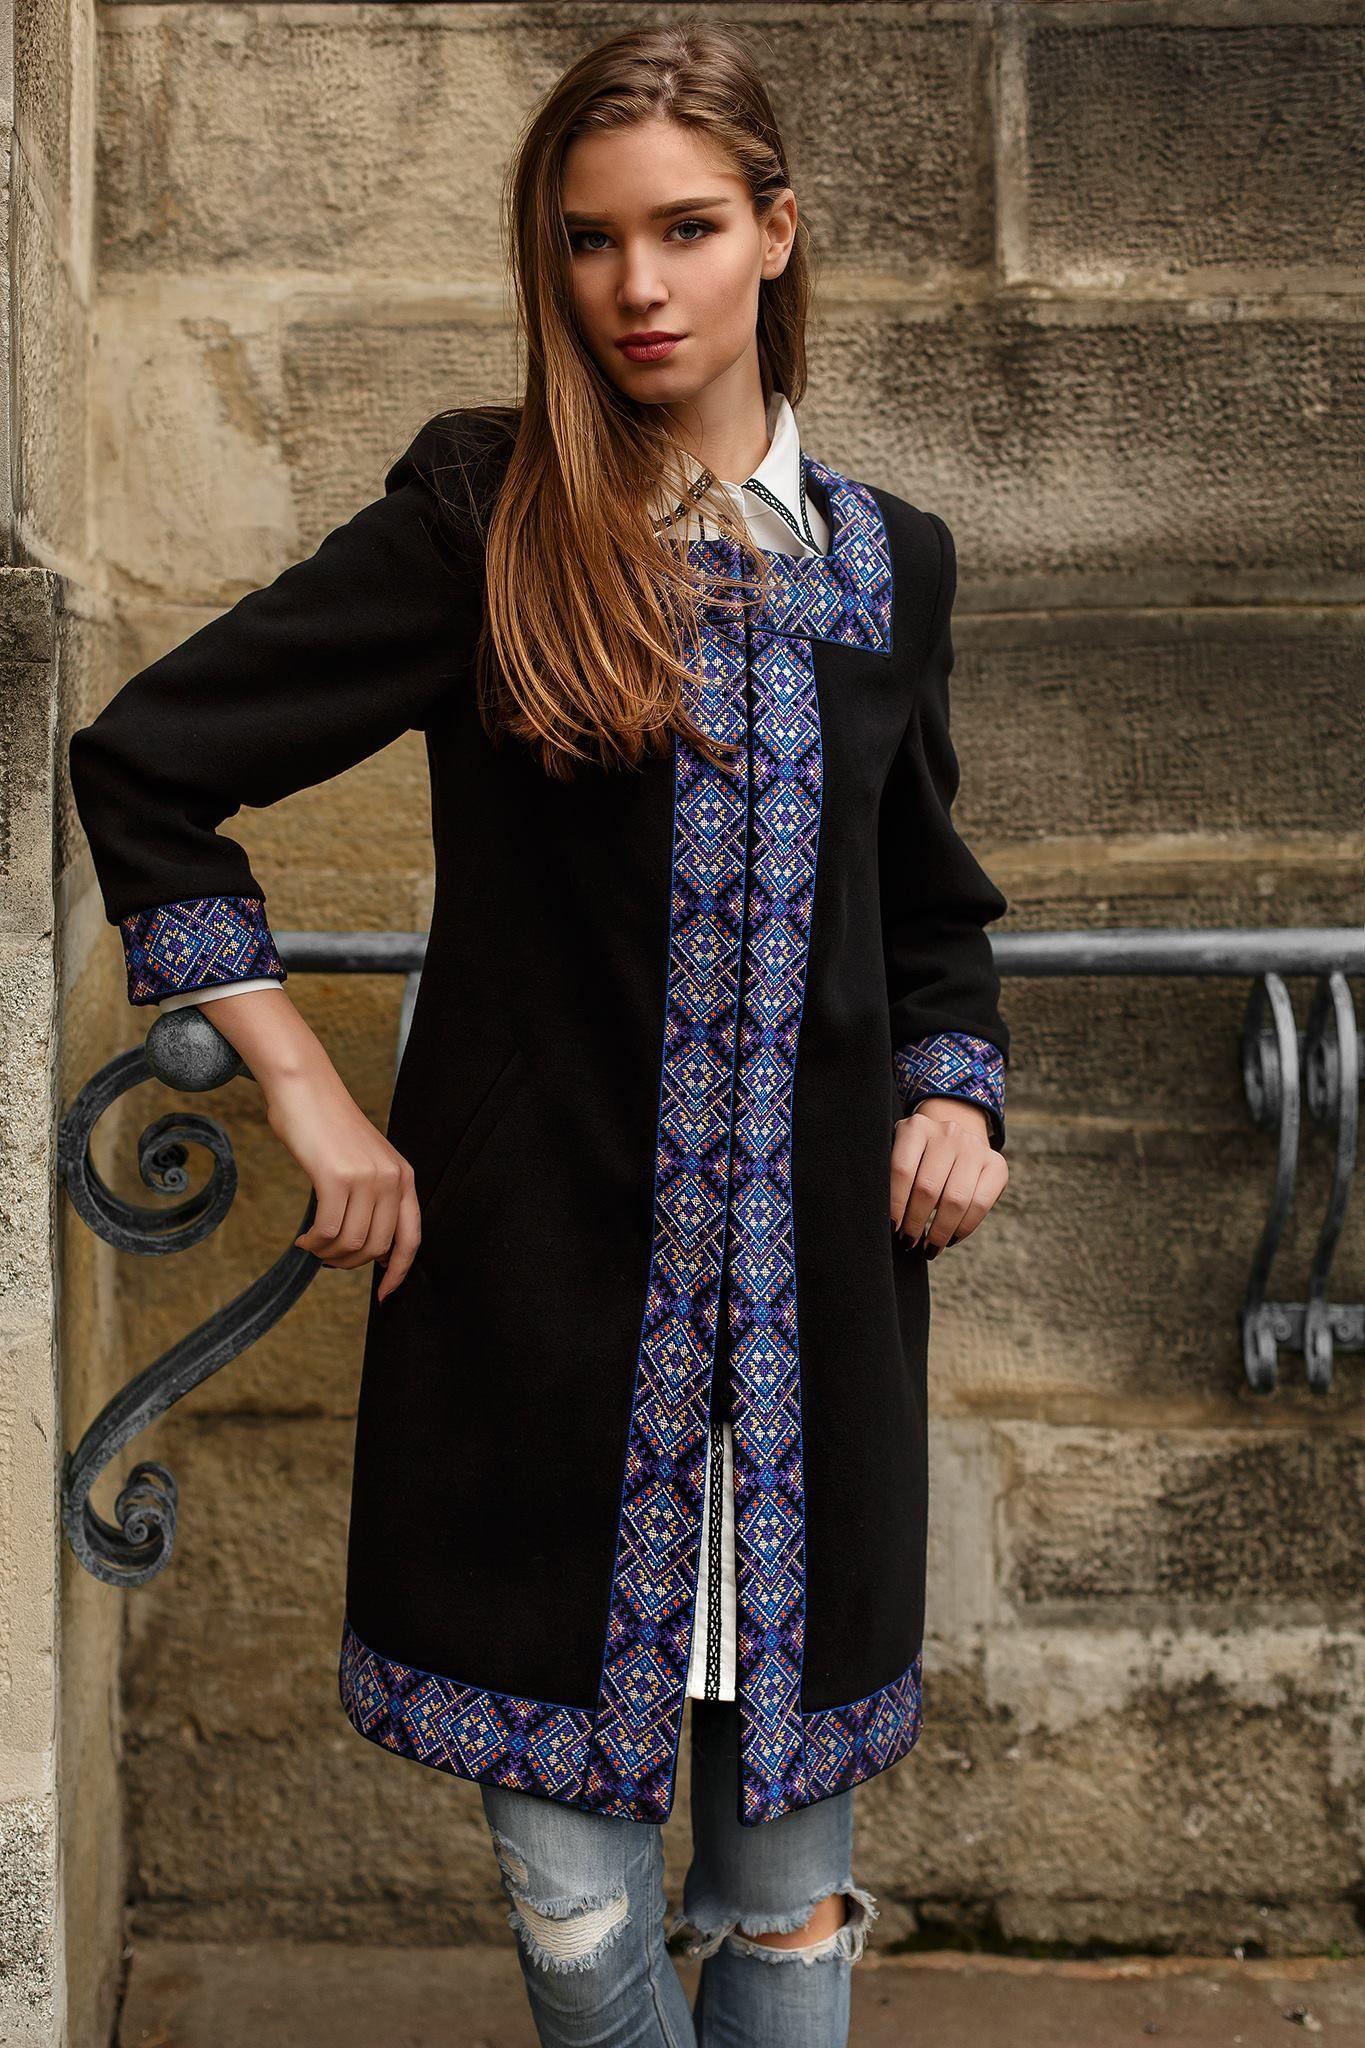 Ukrainian  Style  Spirit of  Ukraine Пальто з вишивкою та мережкою    a82282250c86a